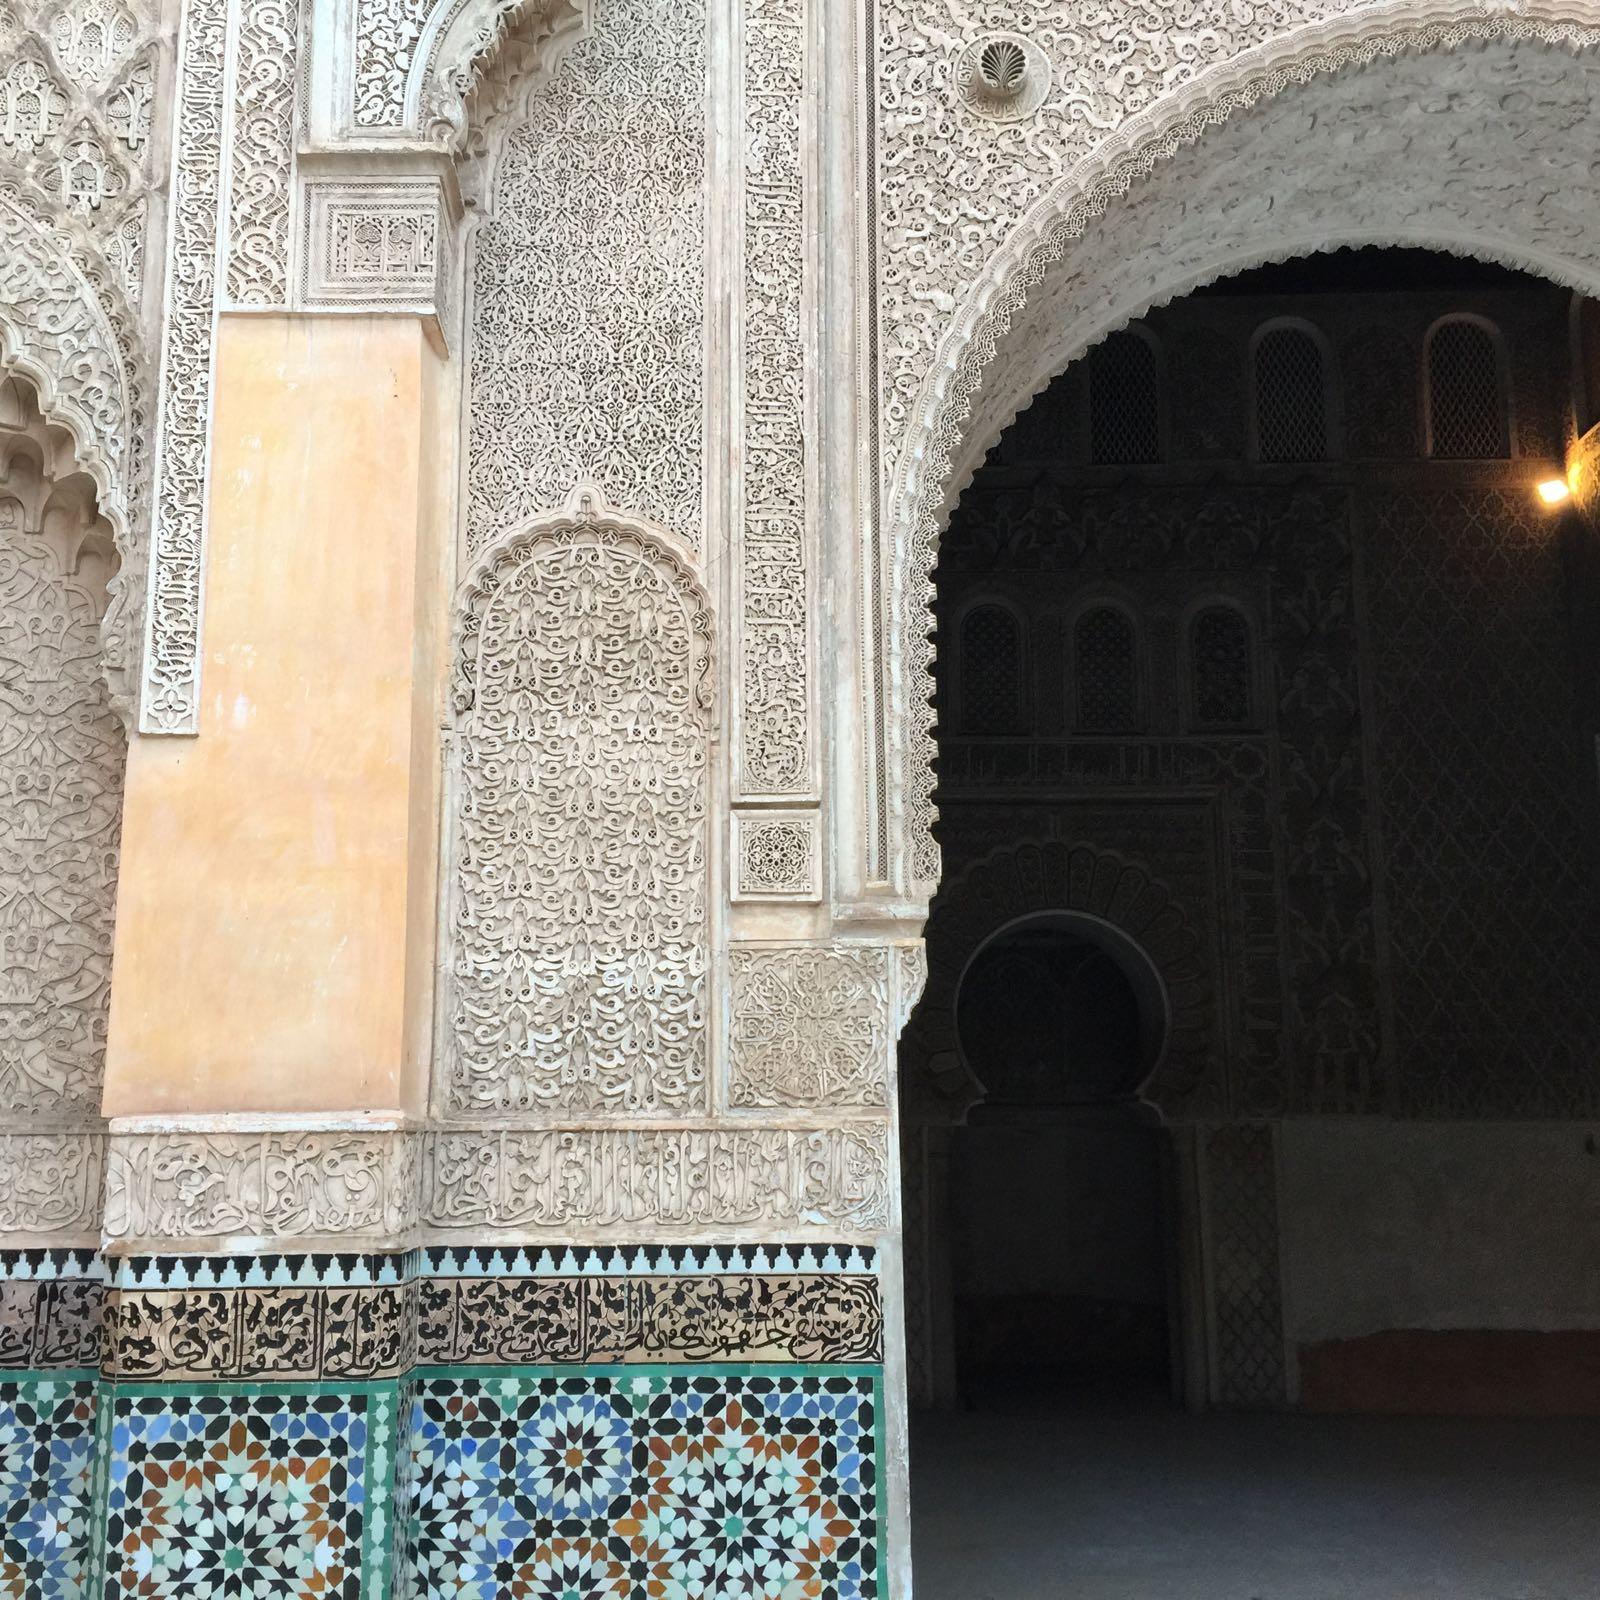 Cunsejos Marrakech. La Madraza